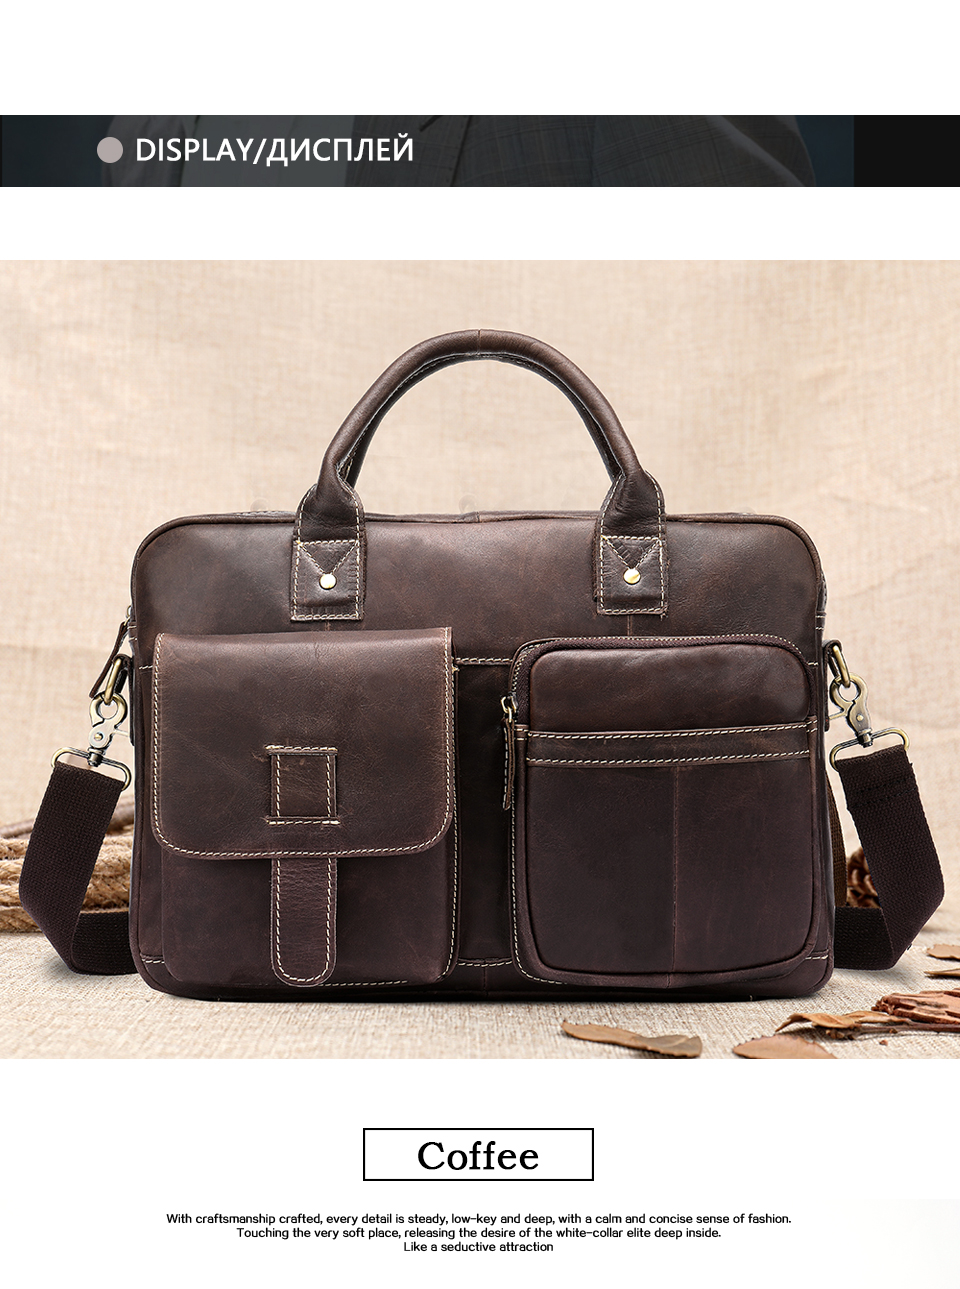 HTB1fMHpaEjrK1RkHFNRq6ySvpXaO WESTAL men's briefcase bag men's genuine Leather laptop bag office bags for men business porte document briefcase handbag 8503